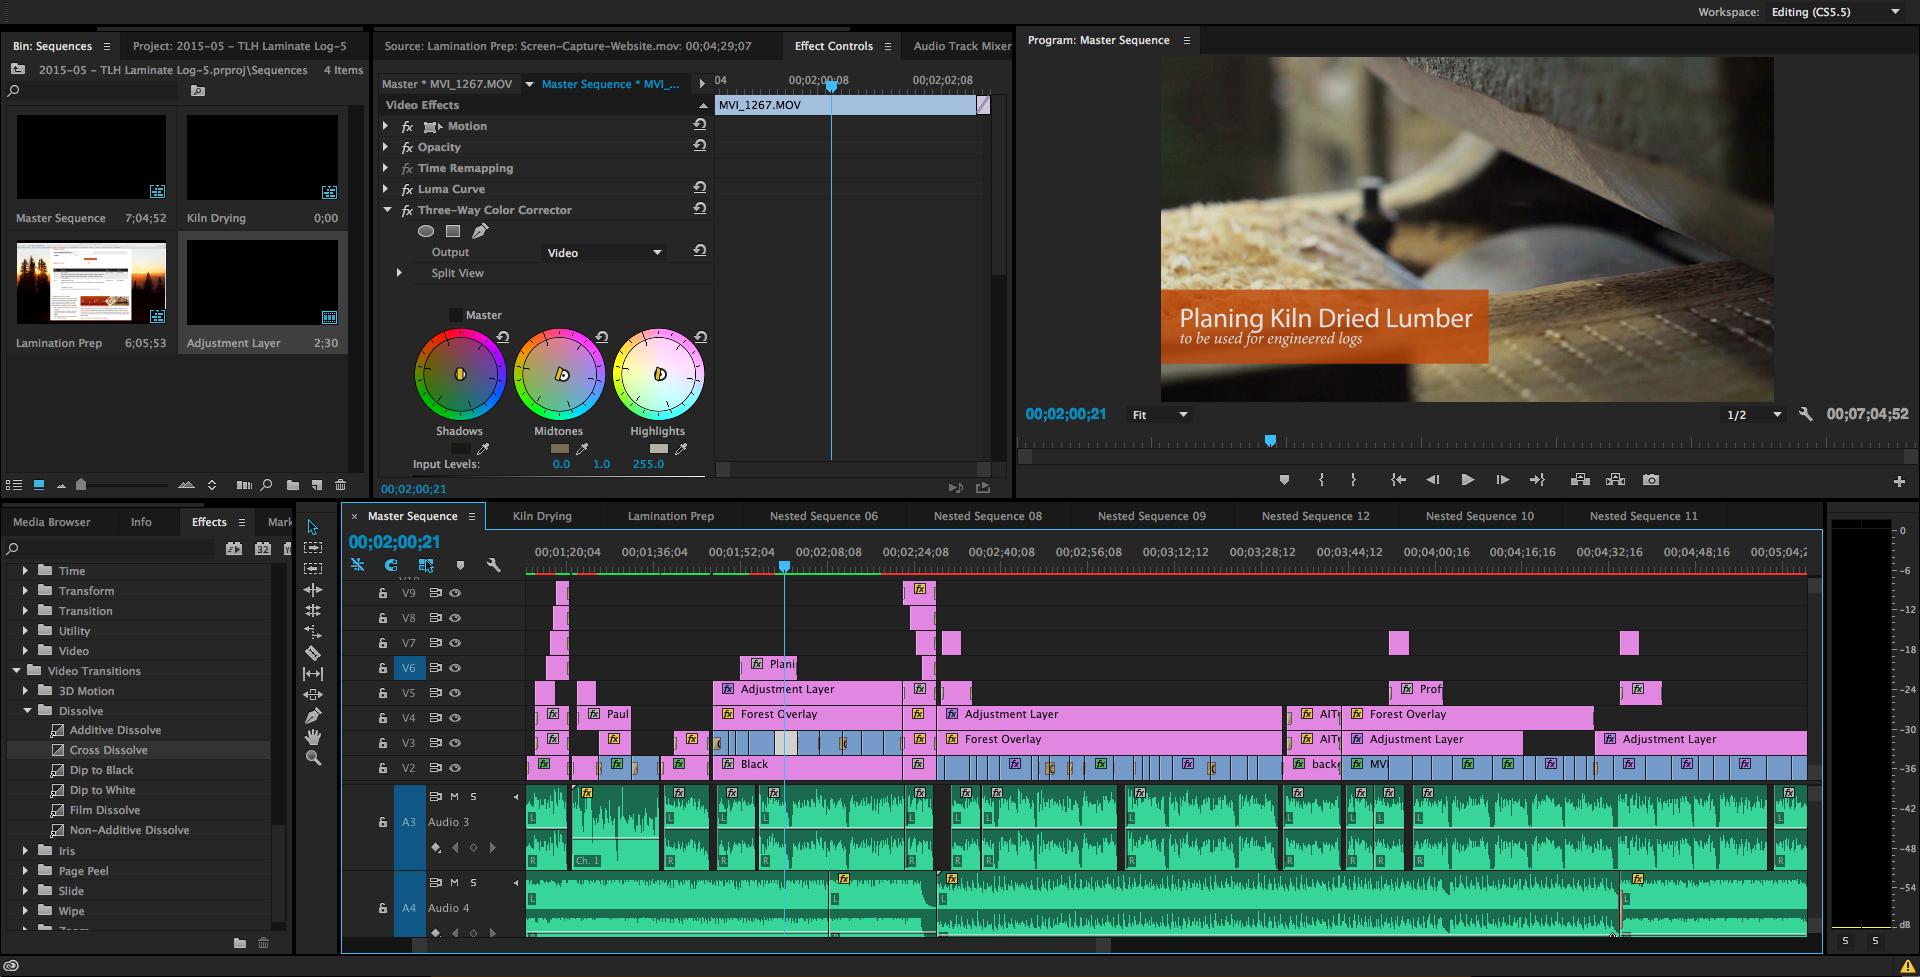 Adobe Fixes Bugs in First Premiere Pro CC 2015 Update ...